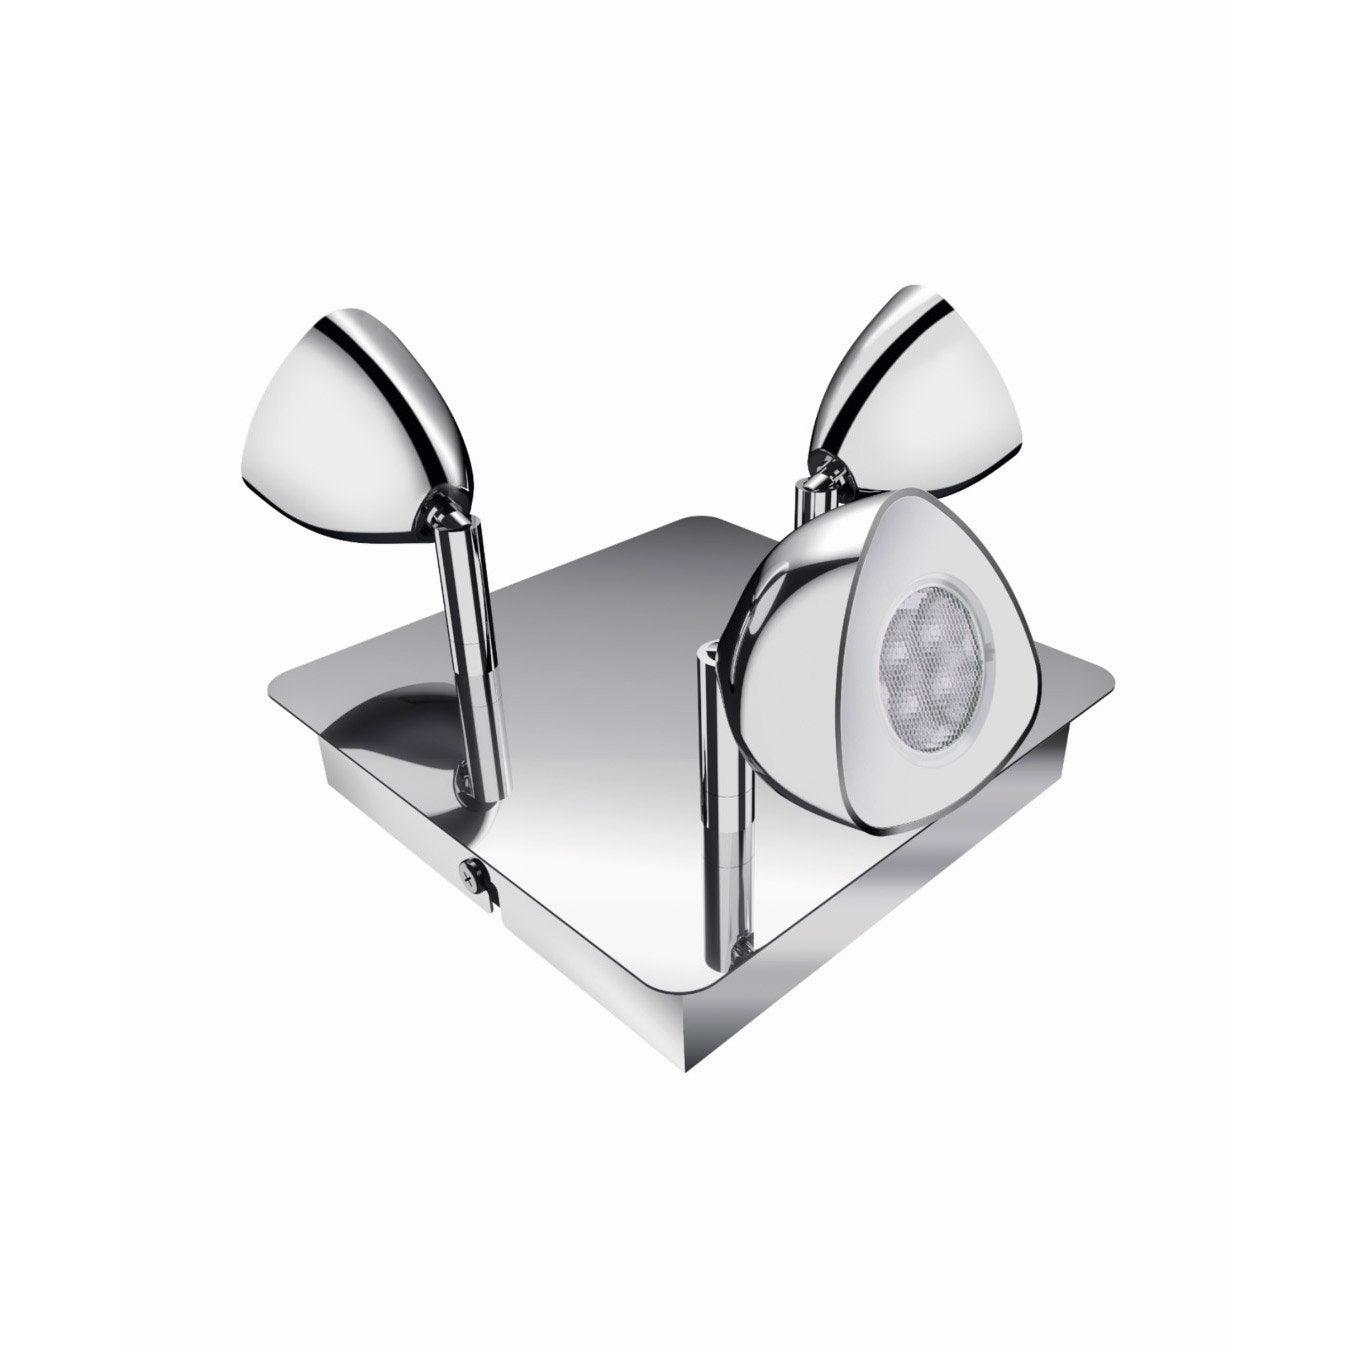 plafonnier 3 spots led int gr e 3x14w chrom calyx osram leroy merlin. Black Bedroom Furniture Sets. Home Design Ideas